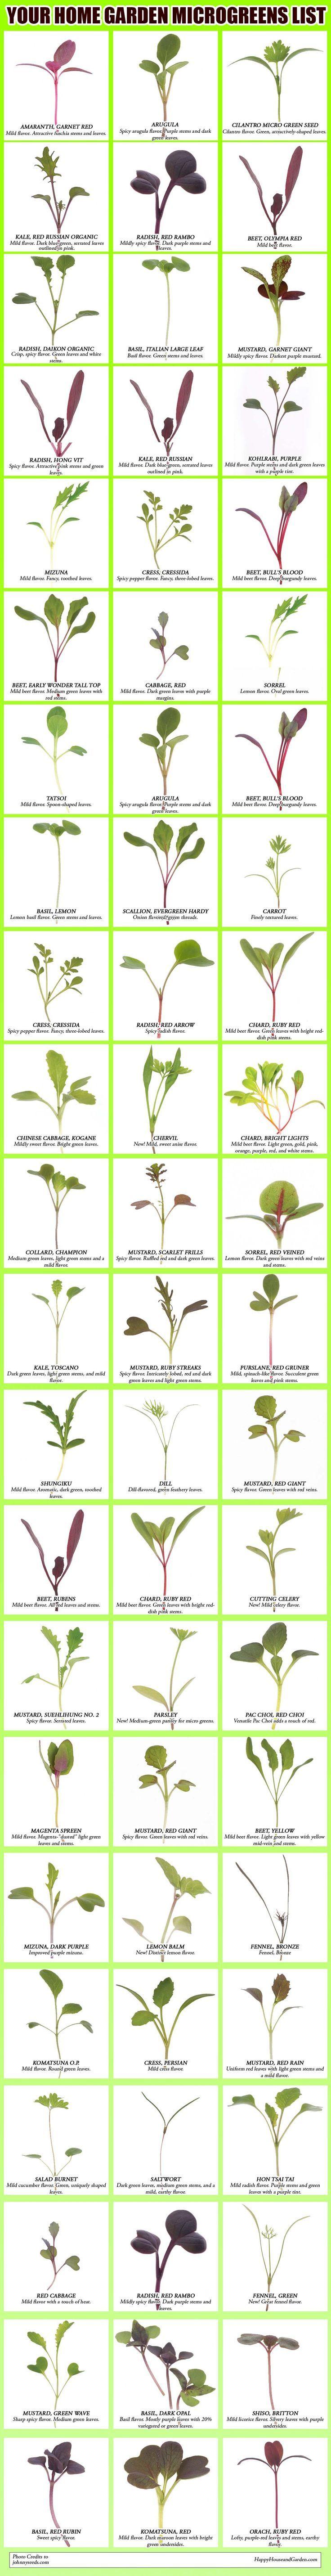 Your Home Garden Microgreens List